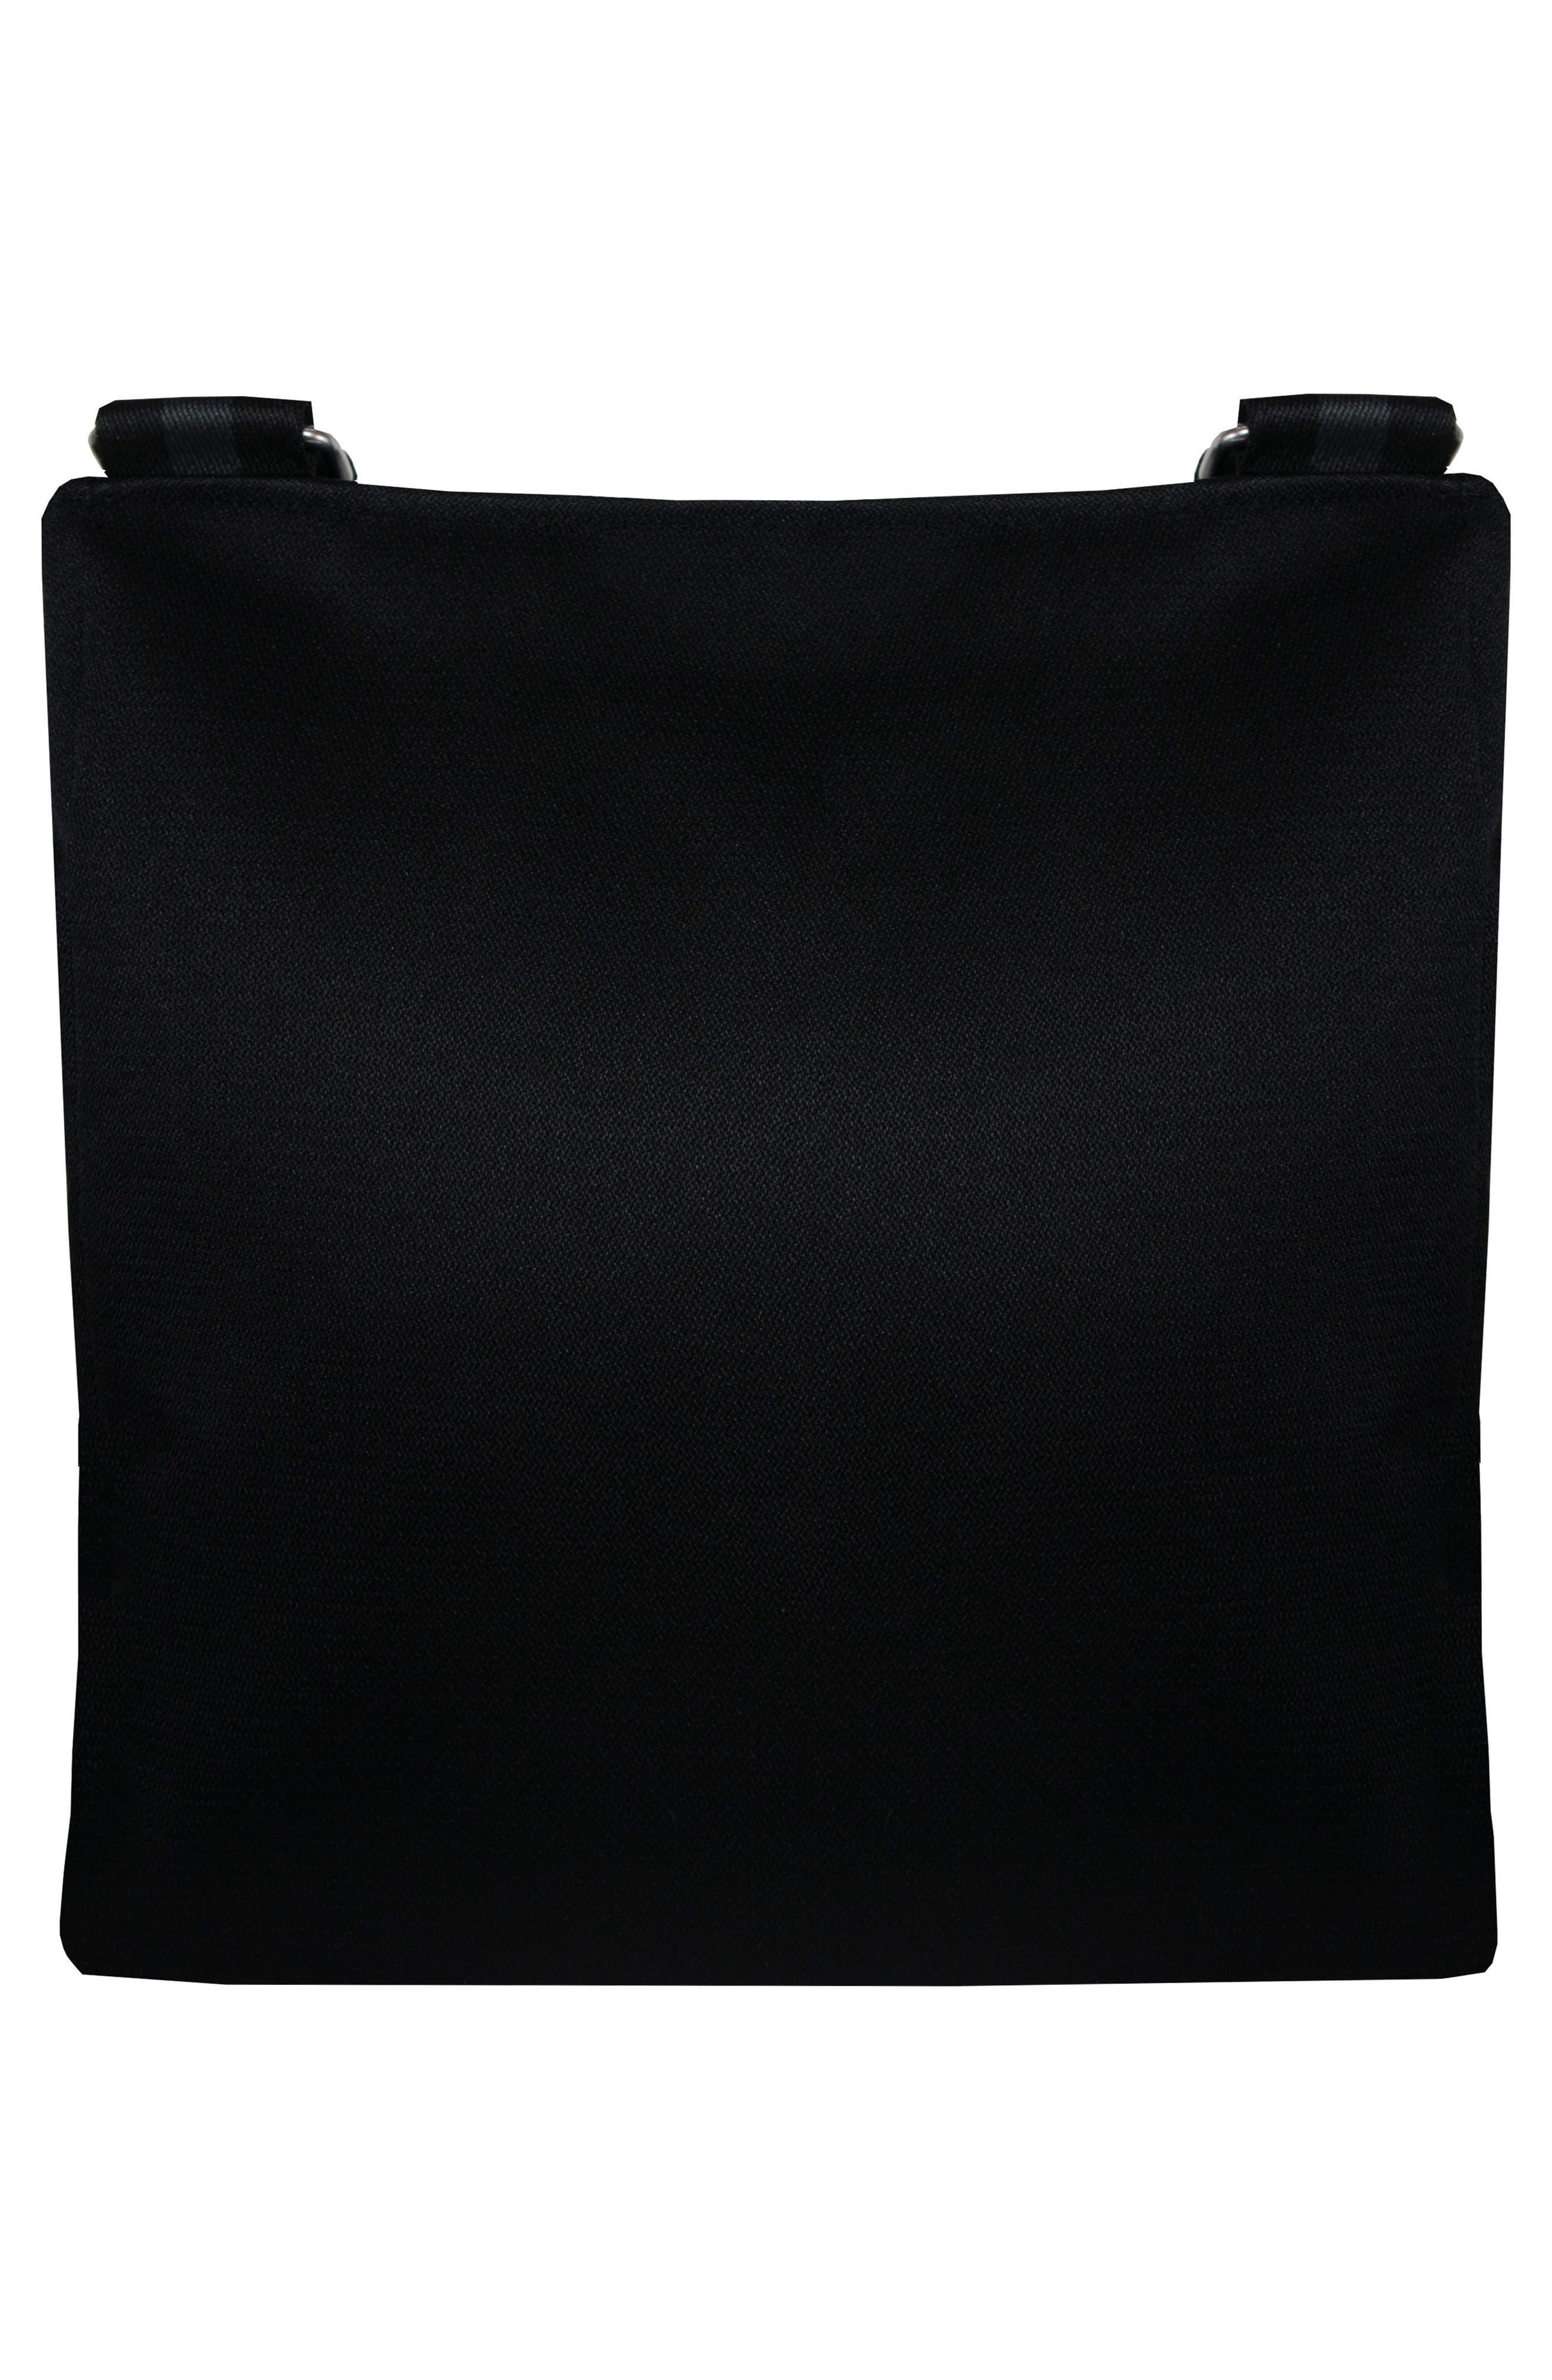 Jag FRFID Crossbody Bag,                             Alternate thumbnail 3, color,                             100